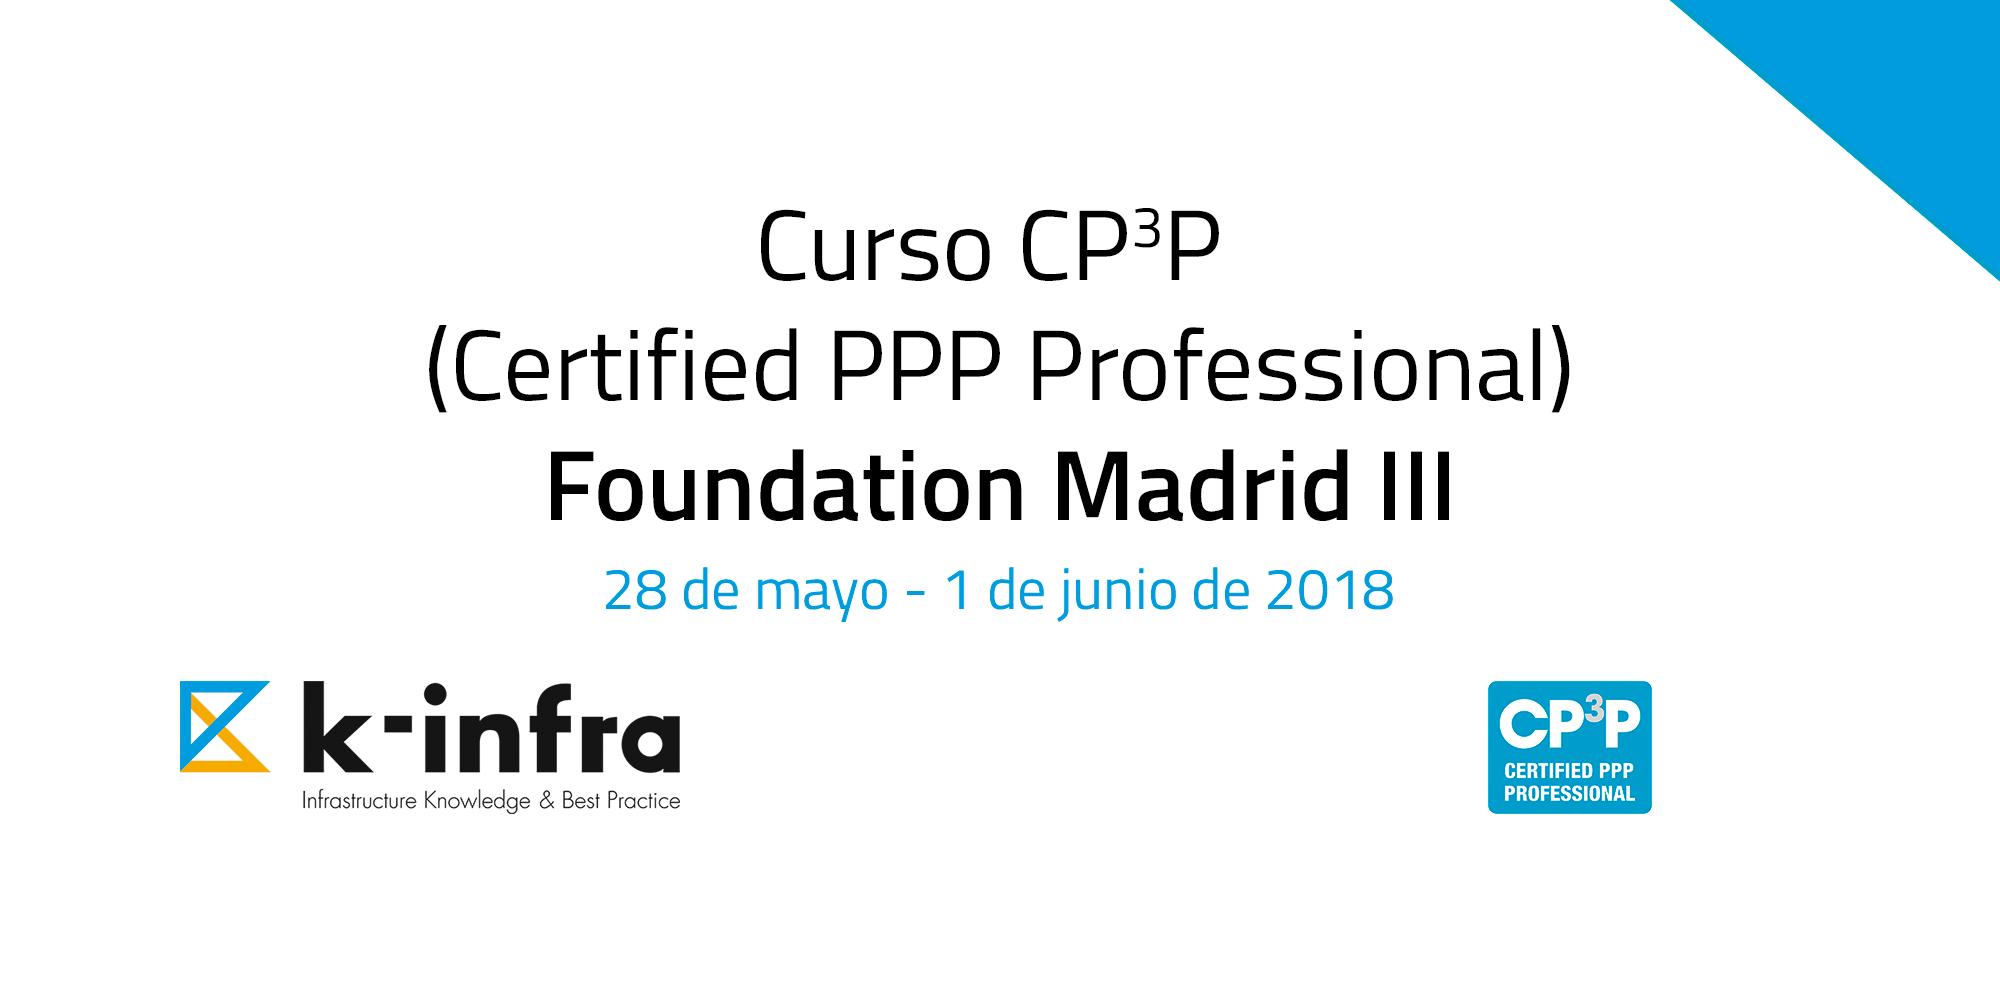 Foundation Madrid